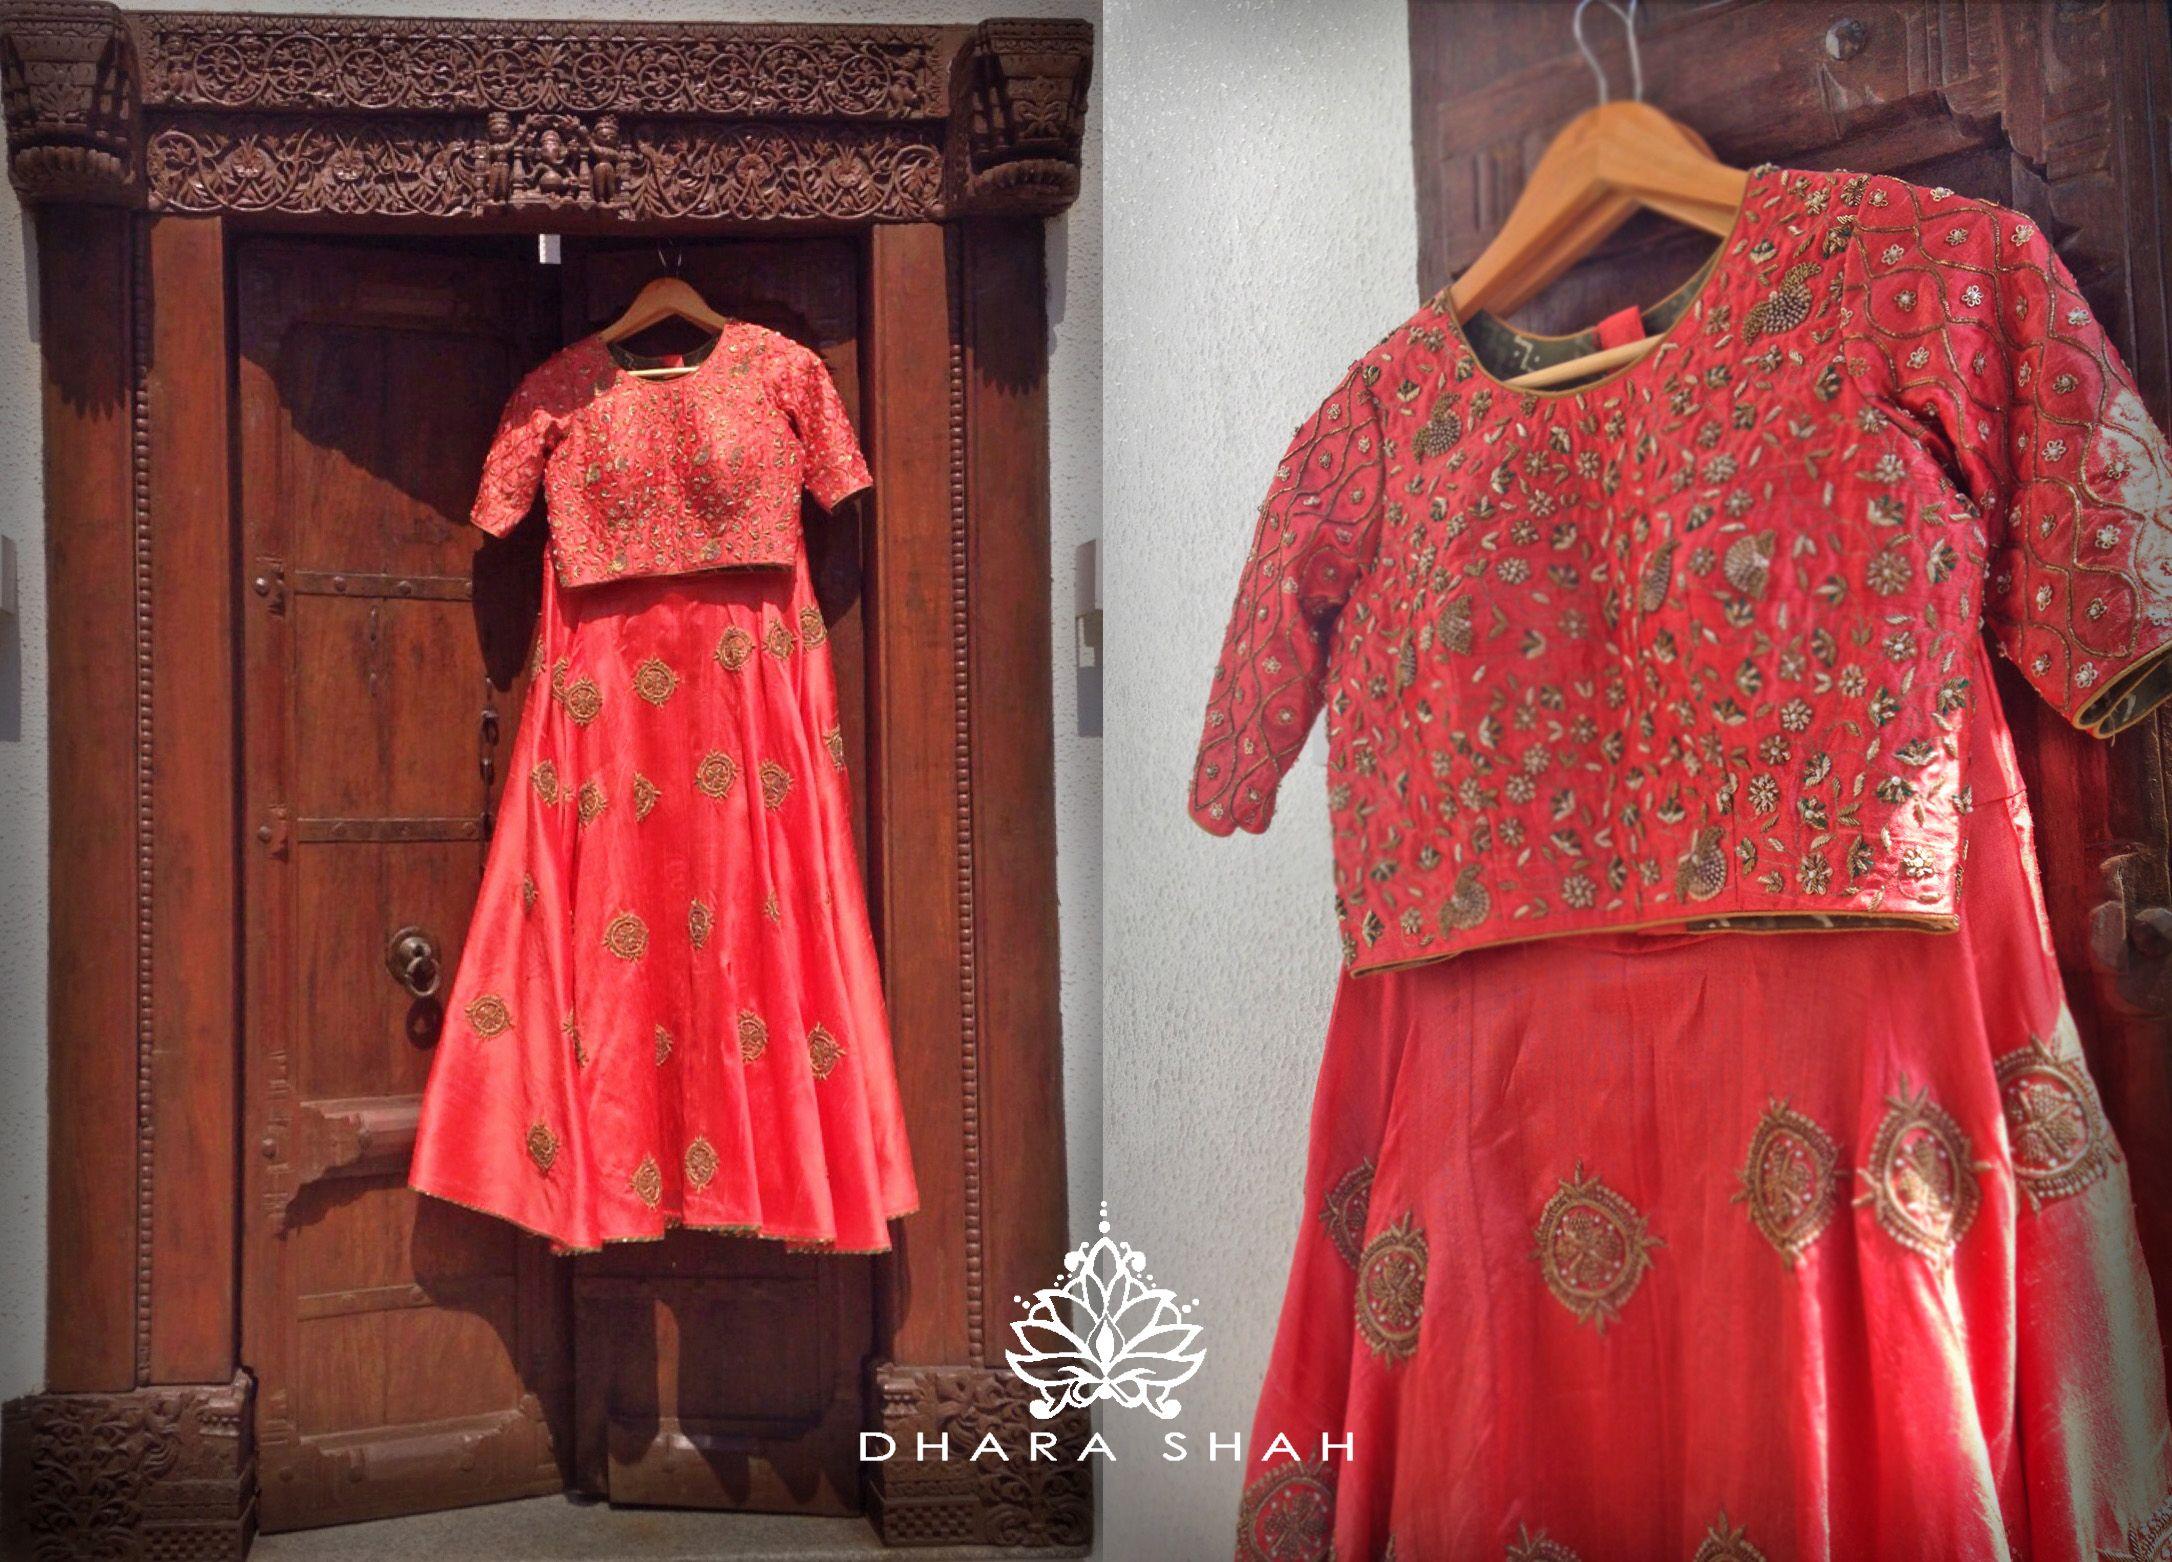 Dharashah Red Zardozi Lehenga Bride Weddingoutfit Croptop Skirt